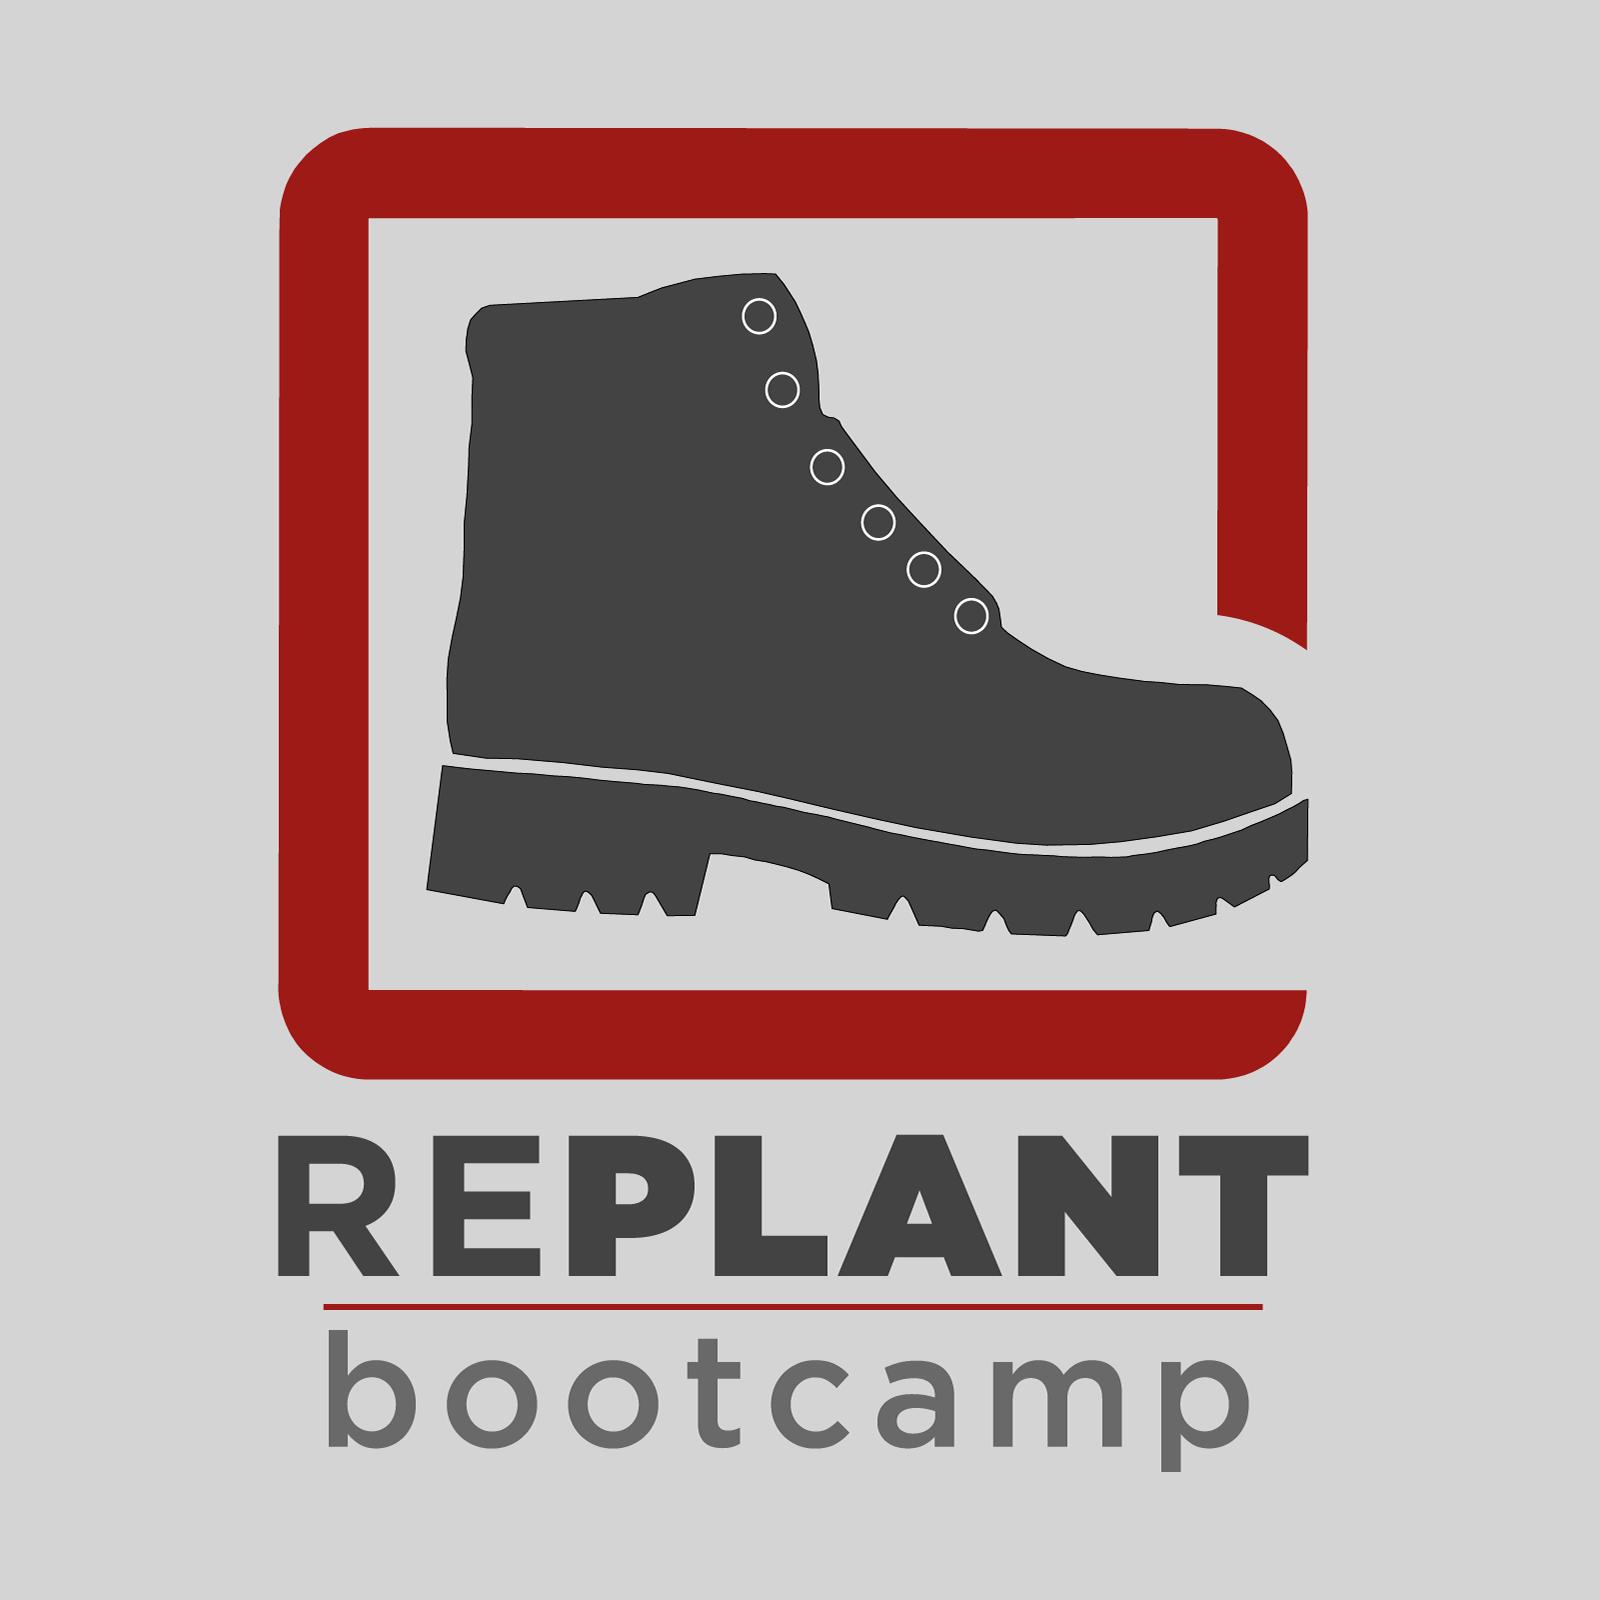 Replant Bootcamp